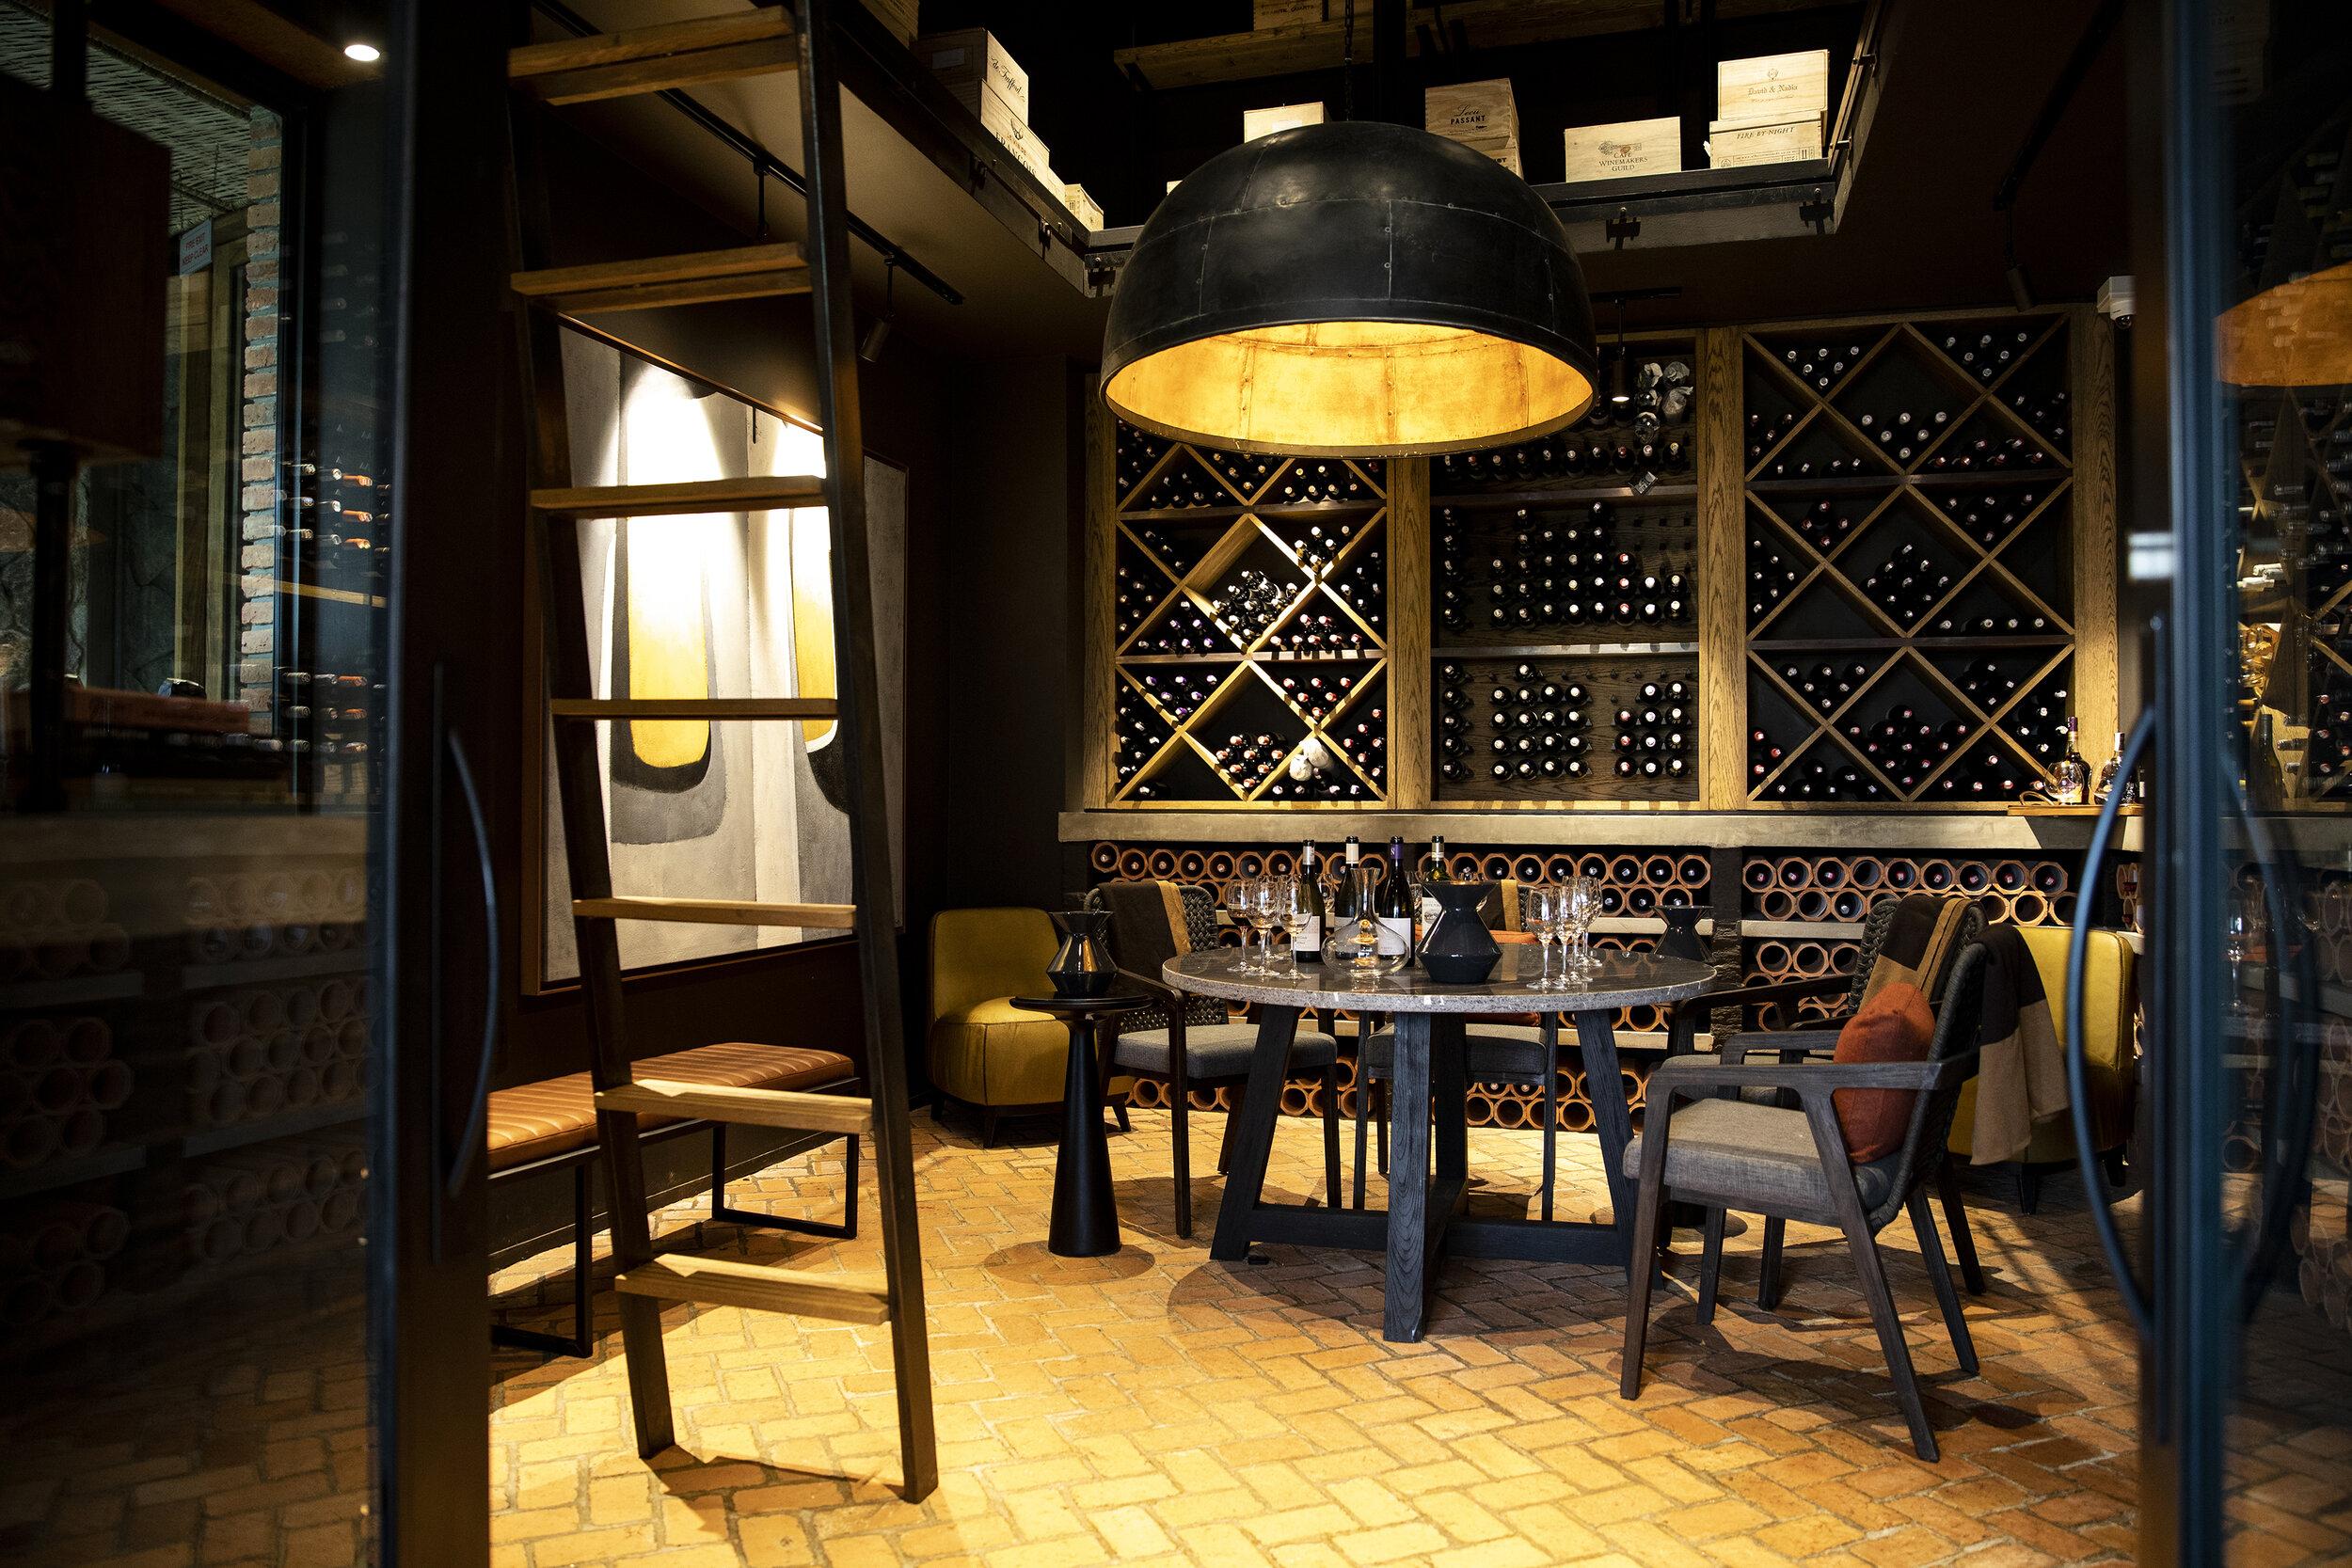 Singita-Kwitonda-Lodge-Wine-cellar 1.jpg